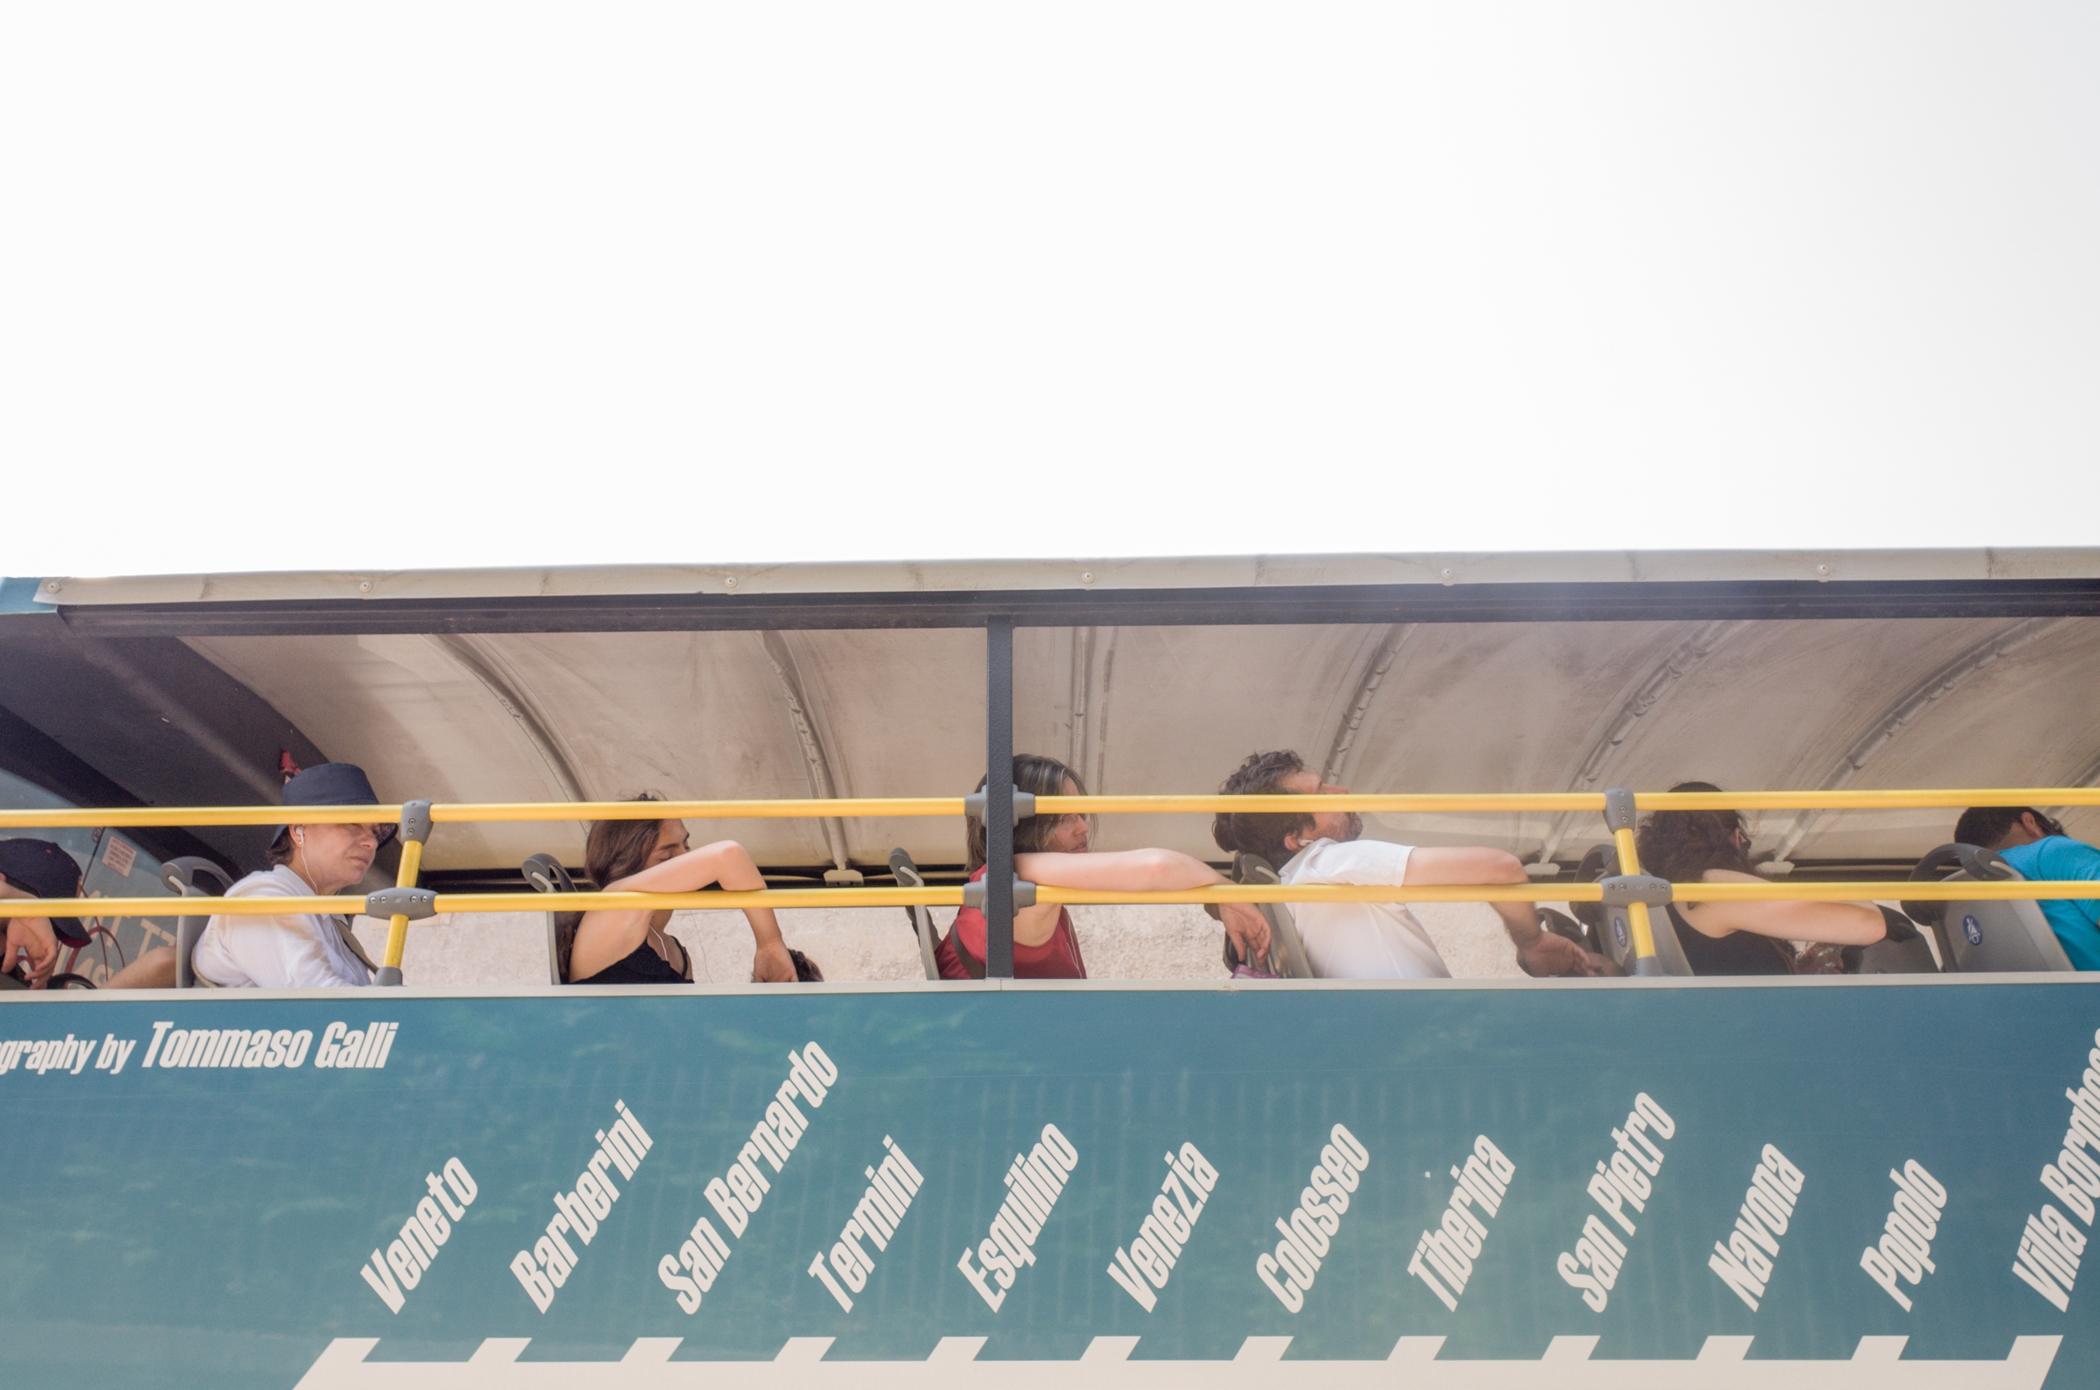 Prospekt Photographers The Passenger ROMA